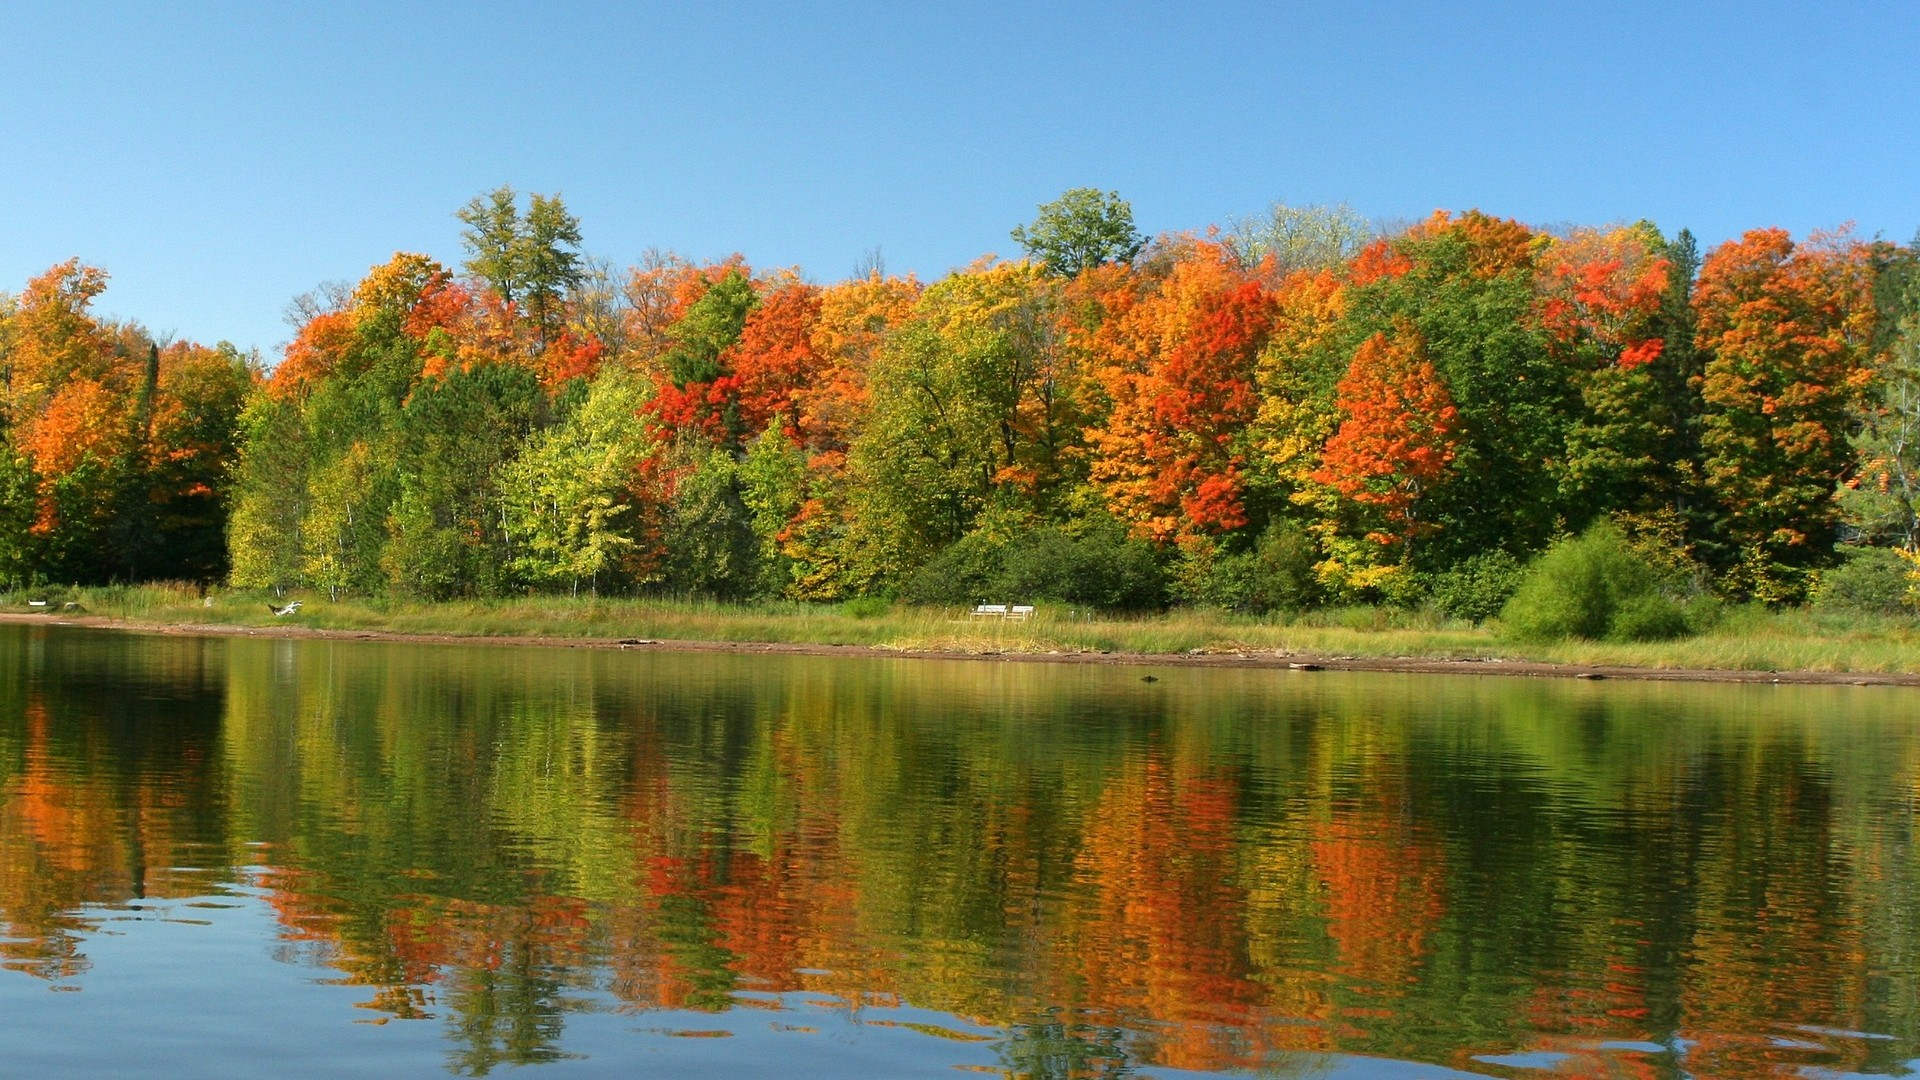 autumn wallpaper scenes water photo 1920x1080 1920x1080